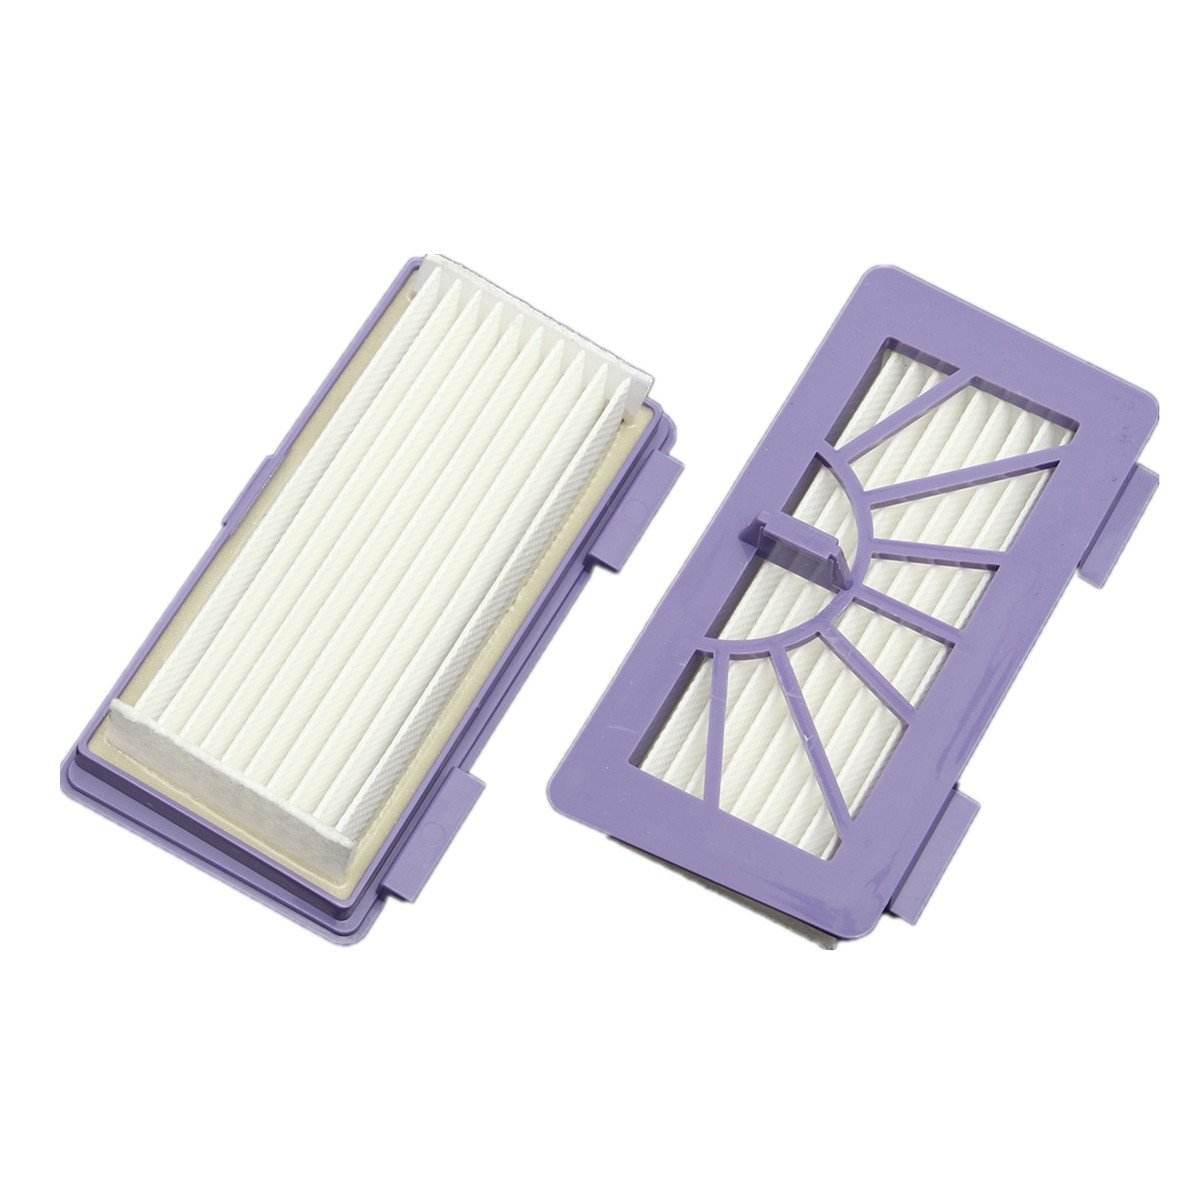 10pcs hepa filter for neato xv-21 xv-15 xv-14 xv-11 xv-12 B07F5X9XQM